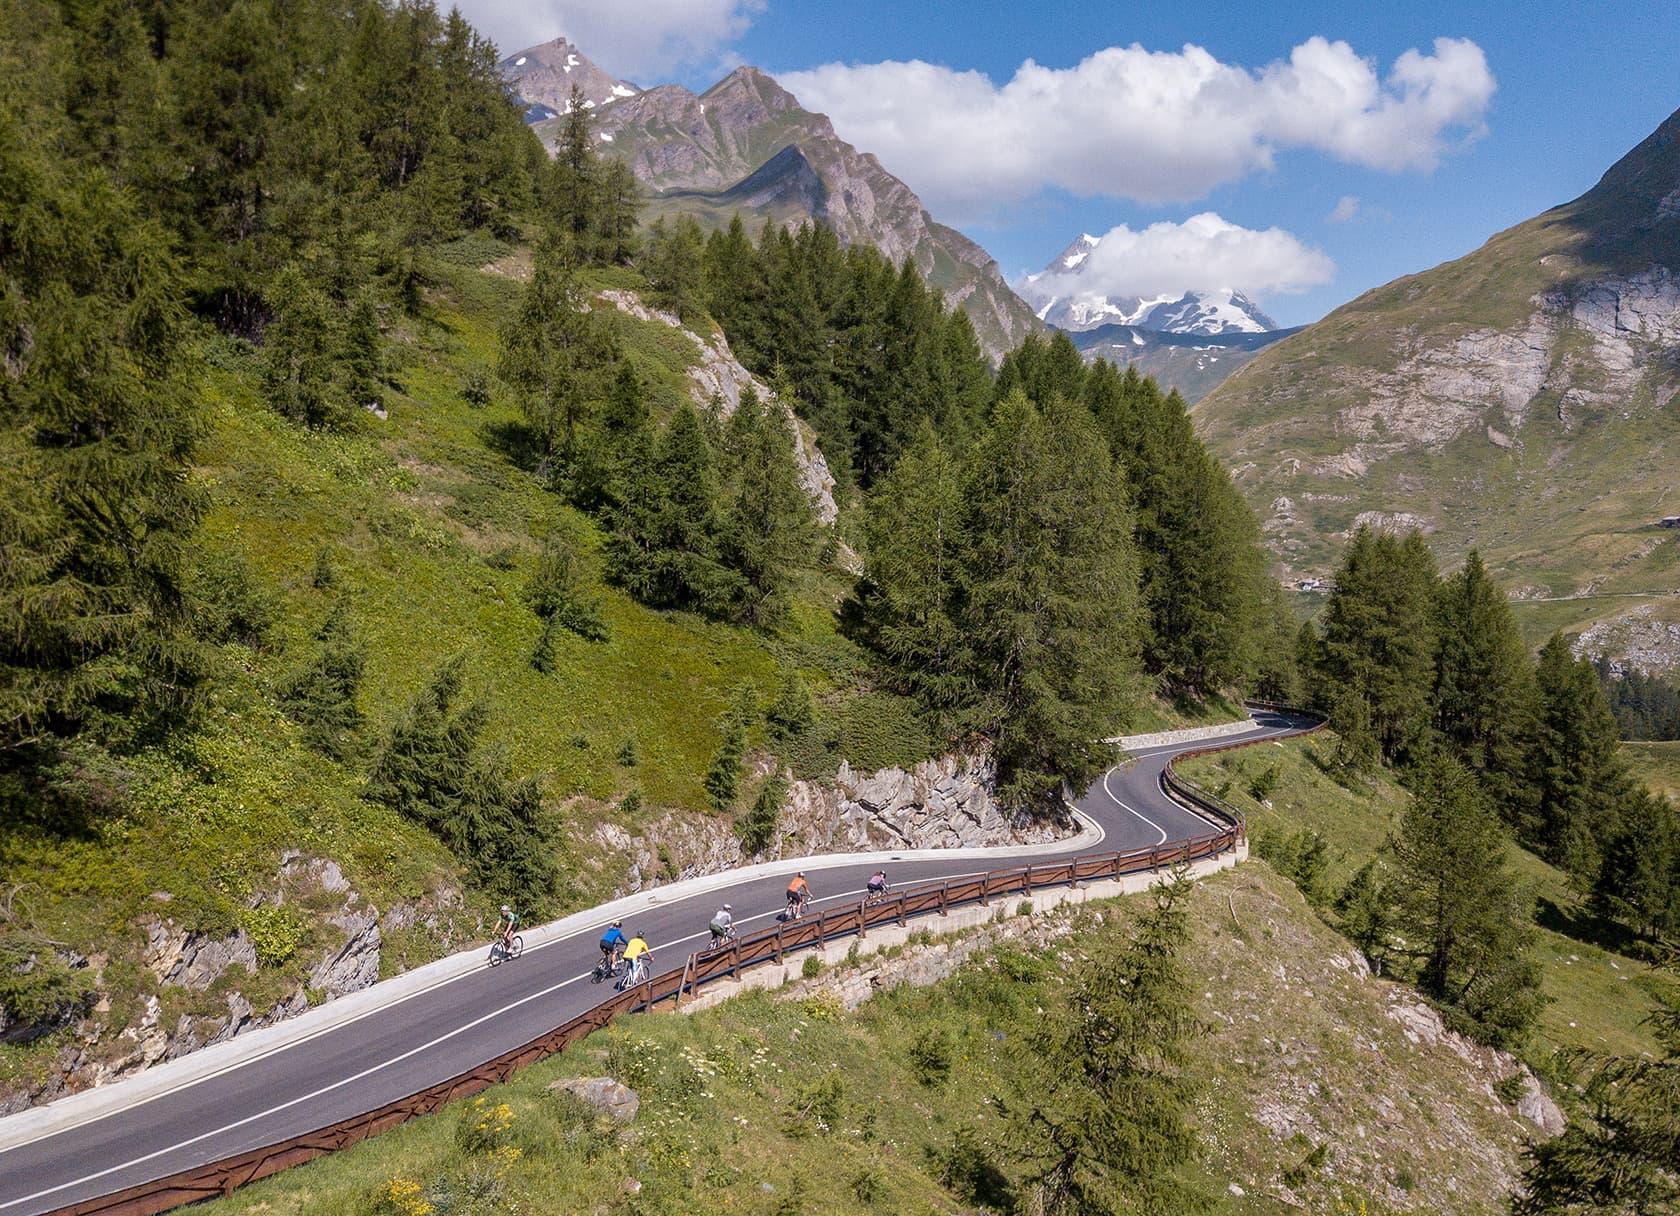 Mountain Biking in France